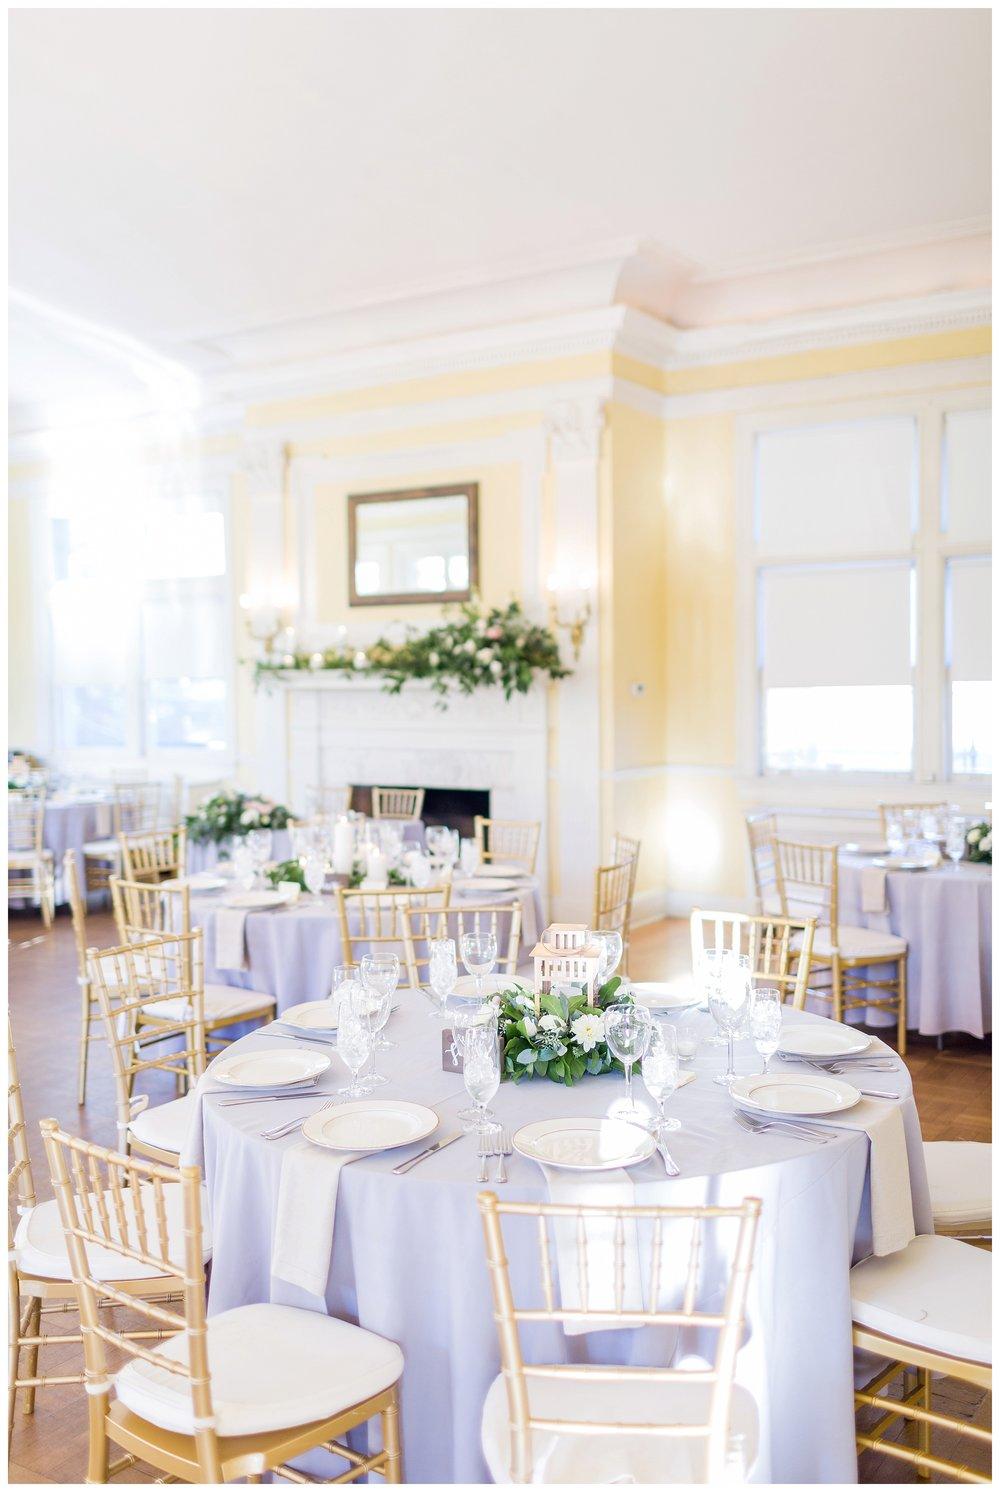 Meridian Hill Park Wedding | Washington DC Wedding Photographer Kir Tuben_0092.jpg